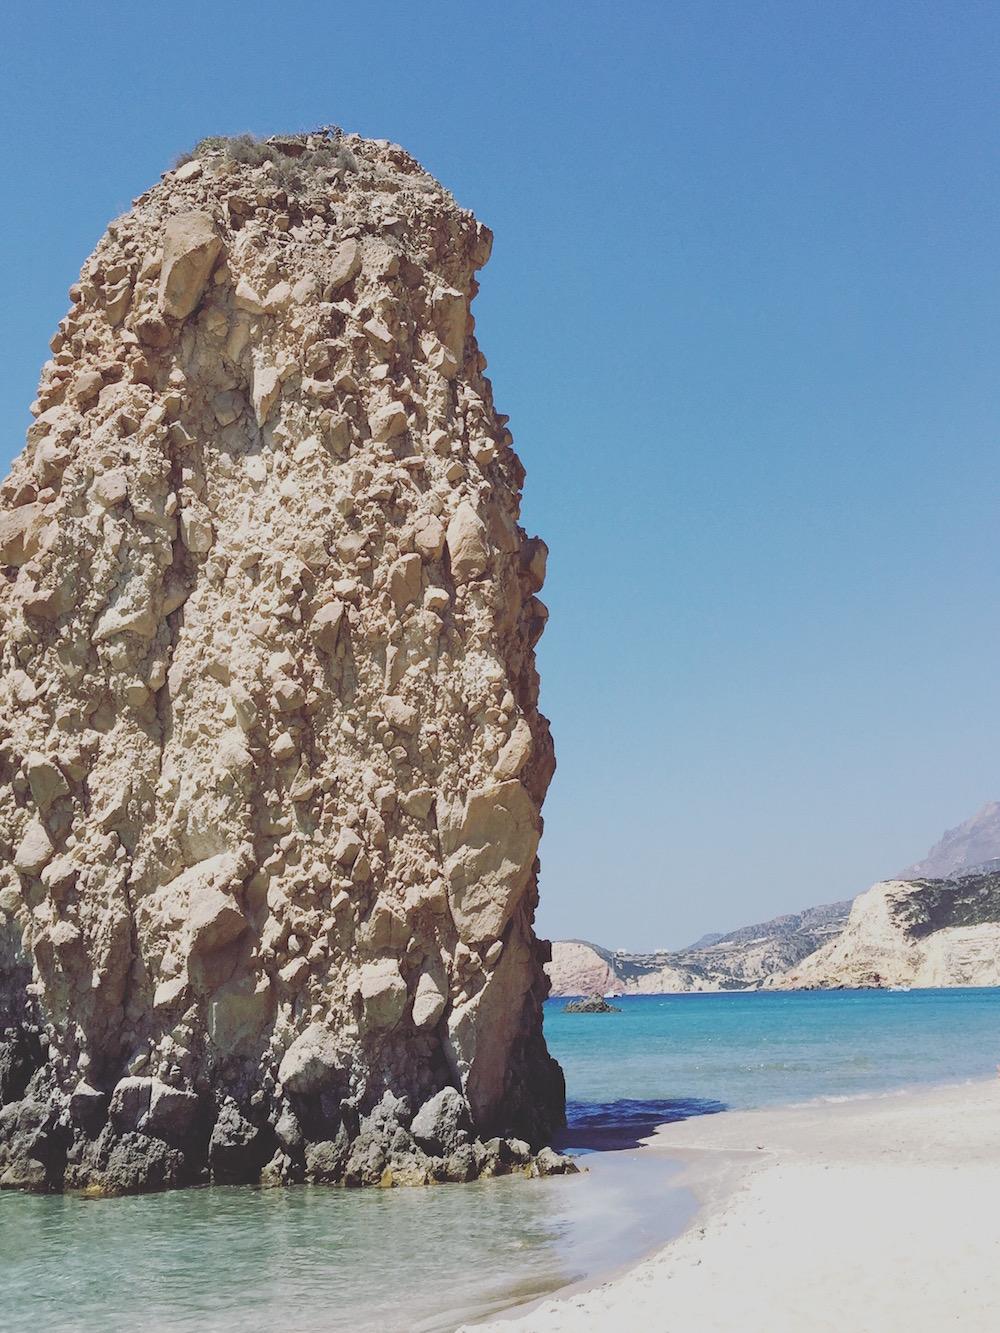 Grèce, Cyclades, plage Firiplaka à Milos